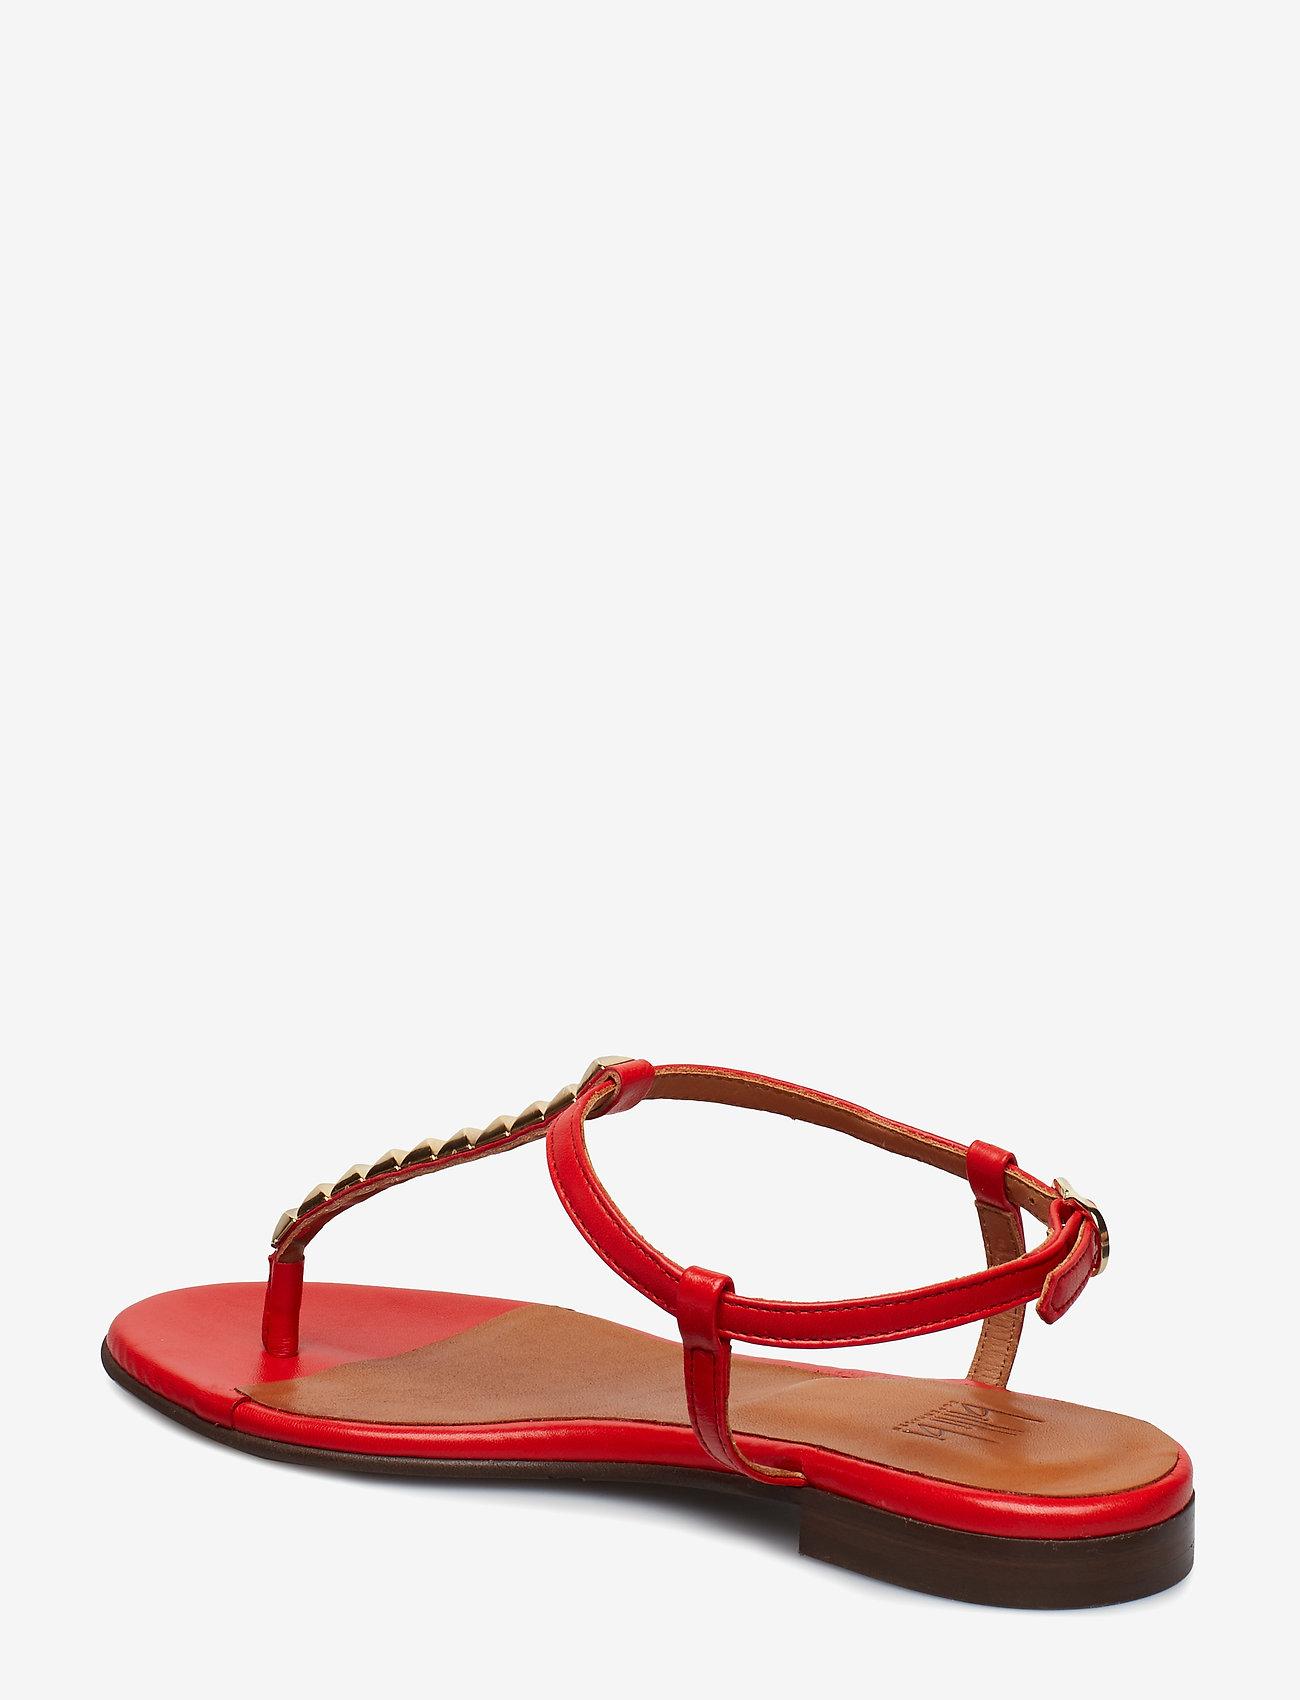 Shoes 8623 (Red Lipstick Nappa/ Gold 772) - Billi Bi